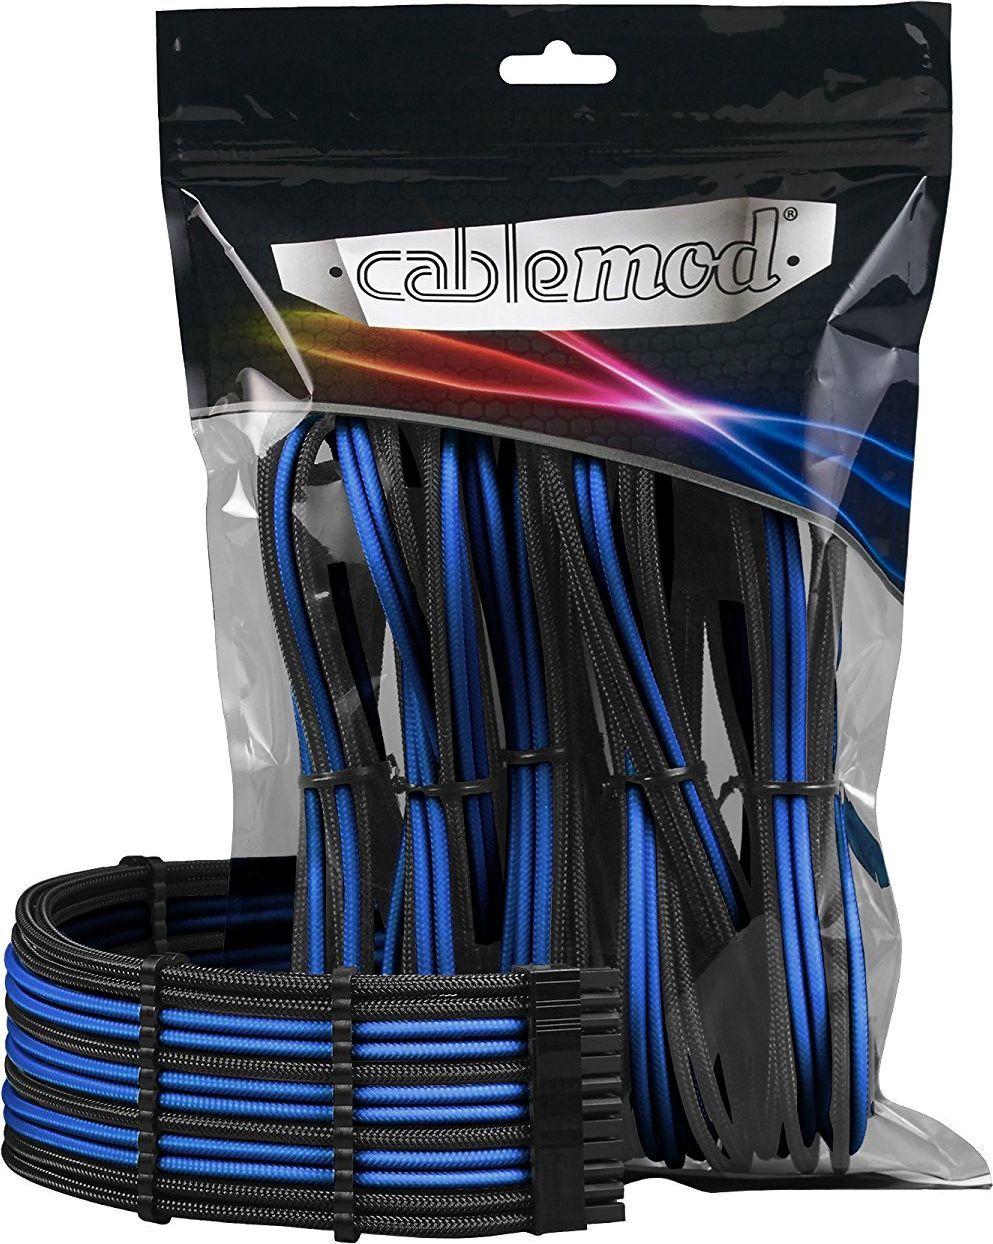 CableMod CableMod PRO Extension Kit black/blue - ModMesh - CM-PCAB-BKIT-NKKB-3P 1